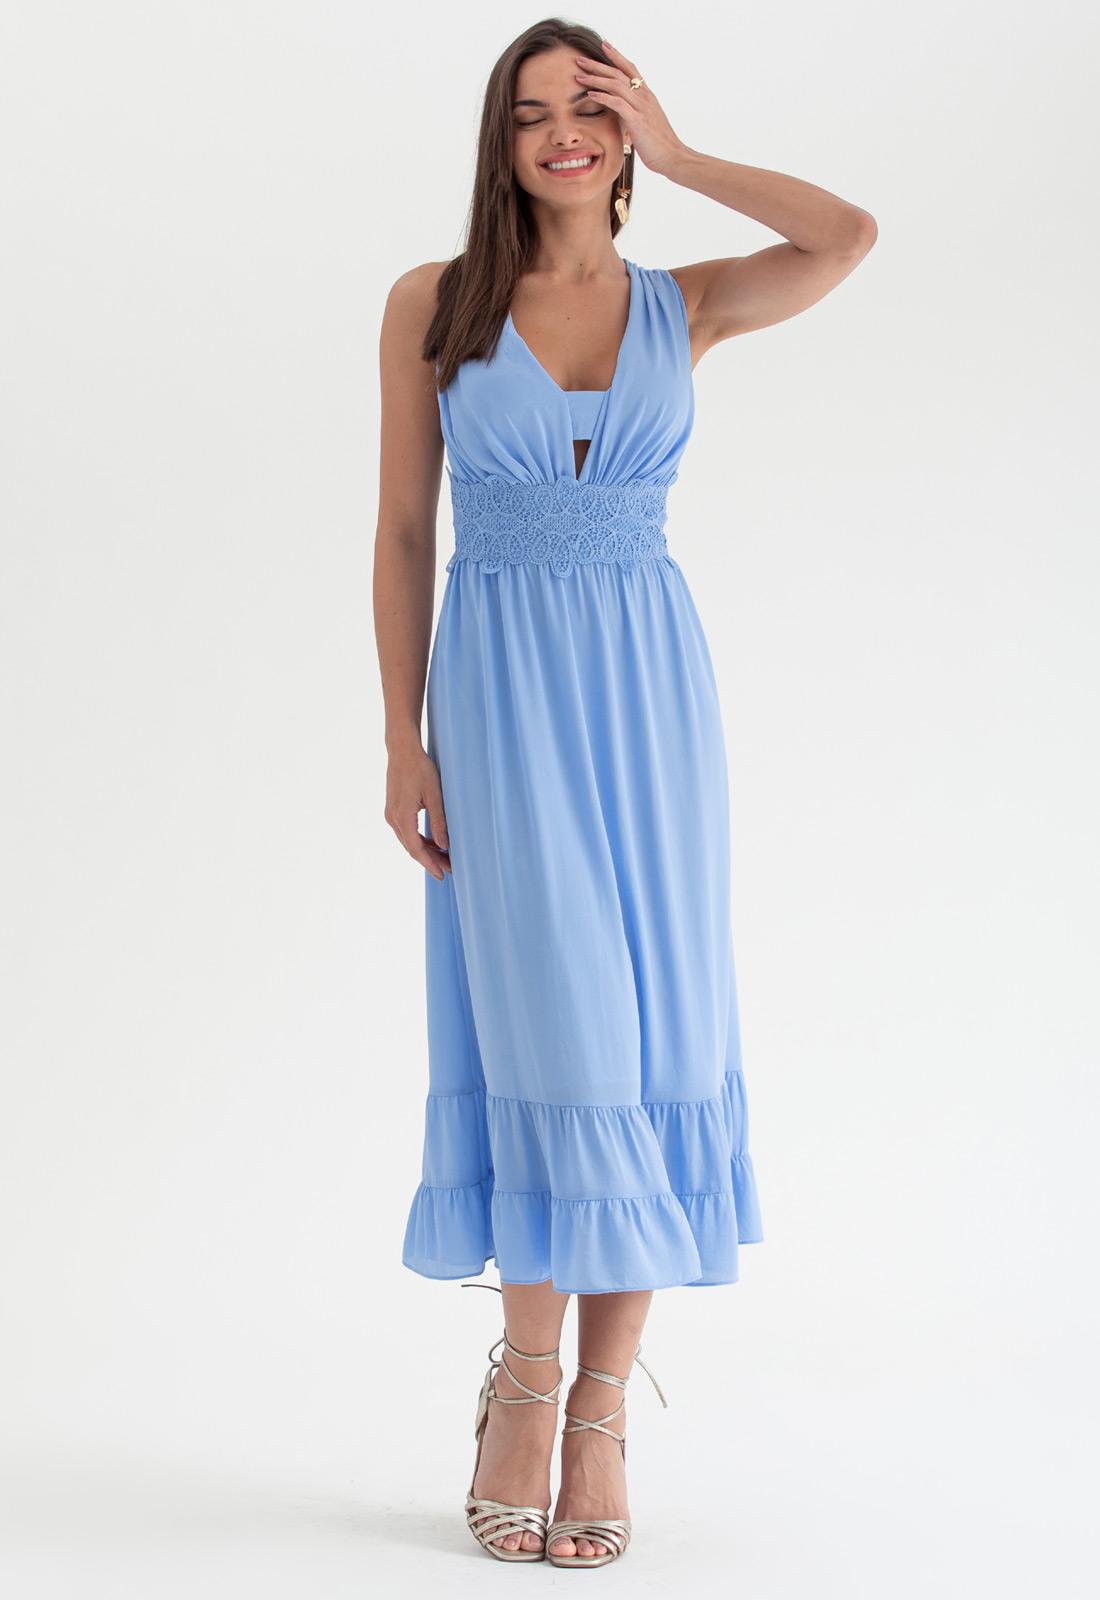 Vestido de festa midi azul serenity - Ref. 2691